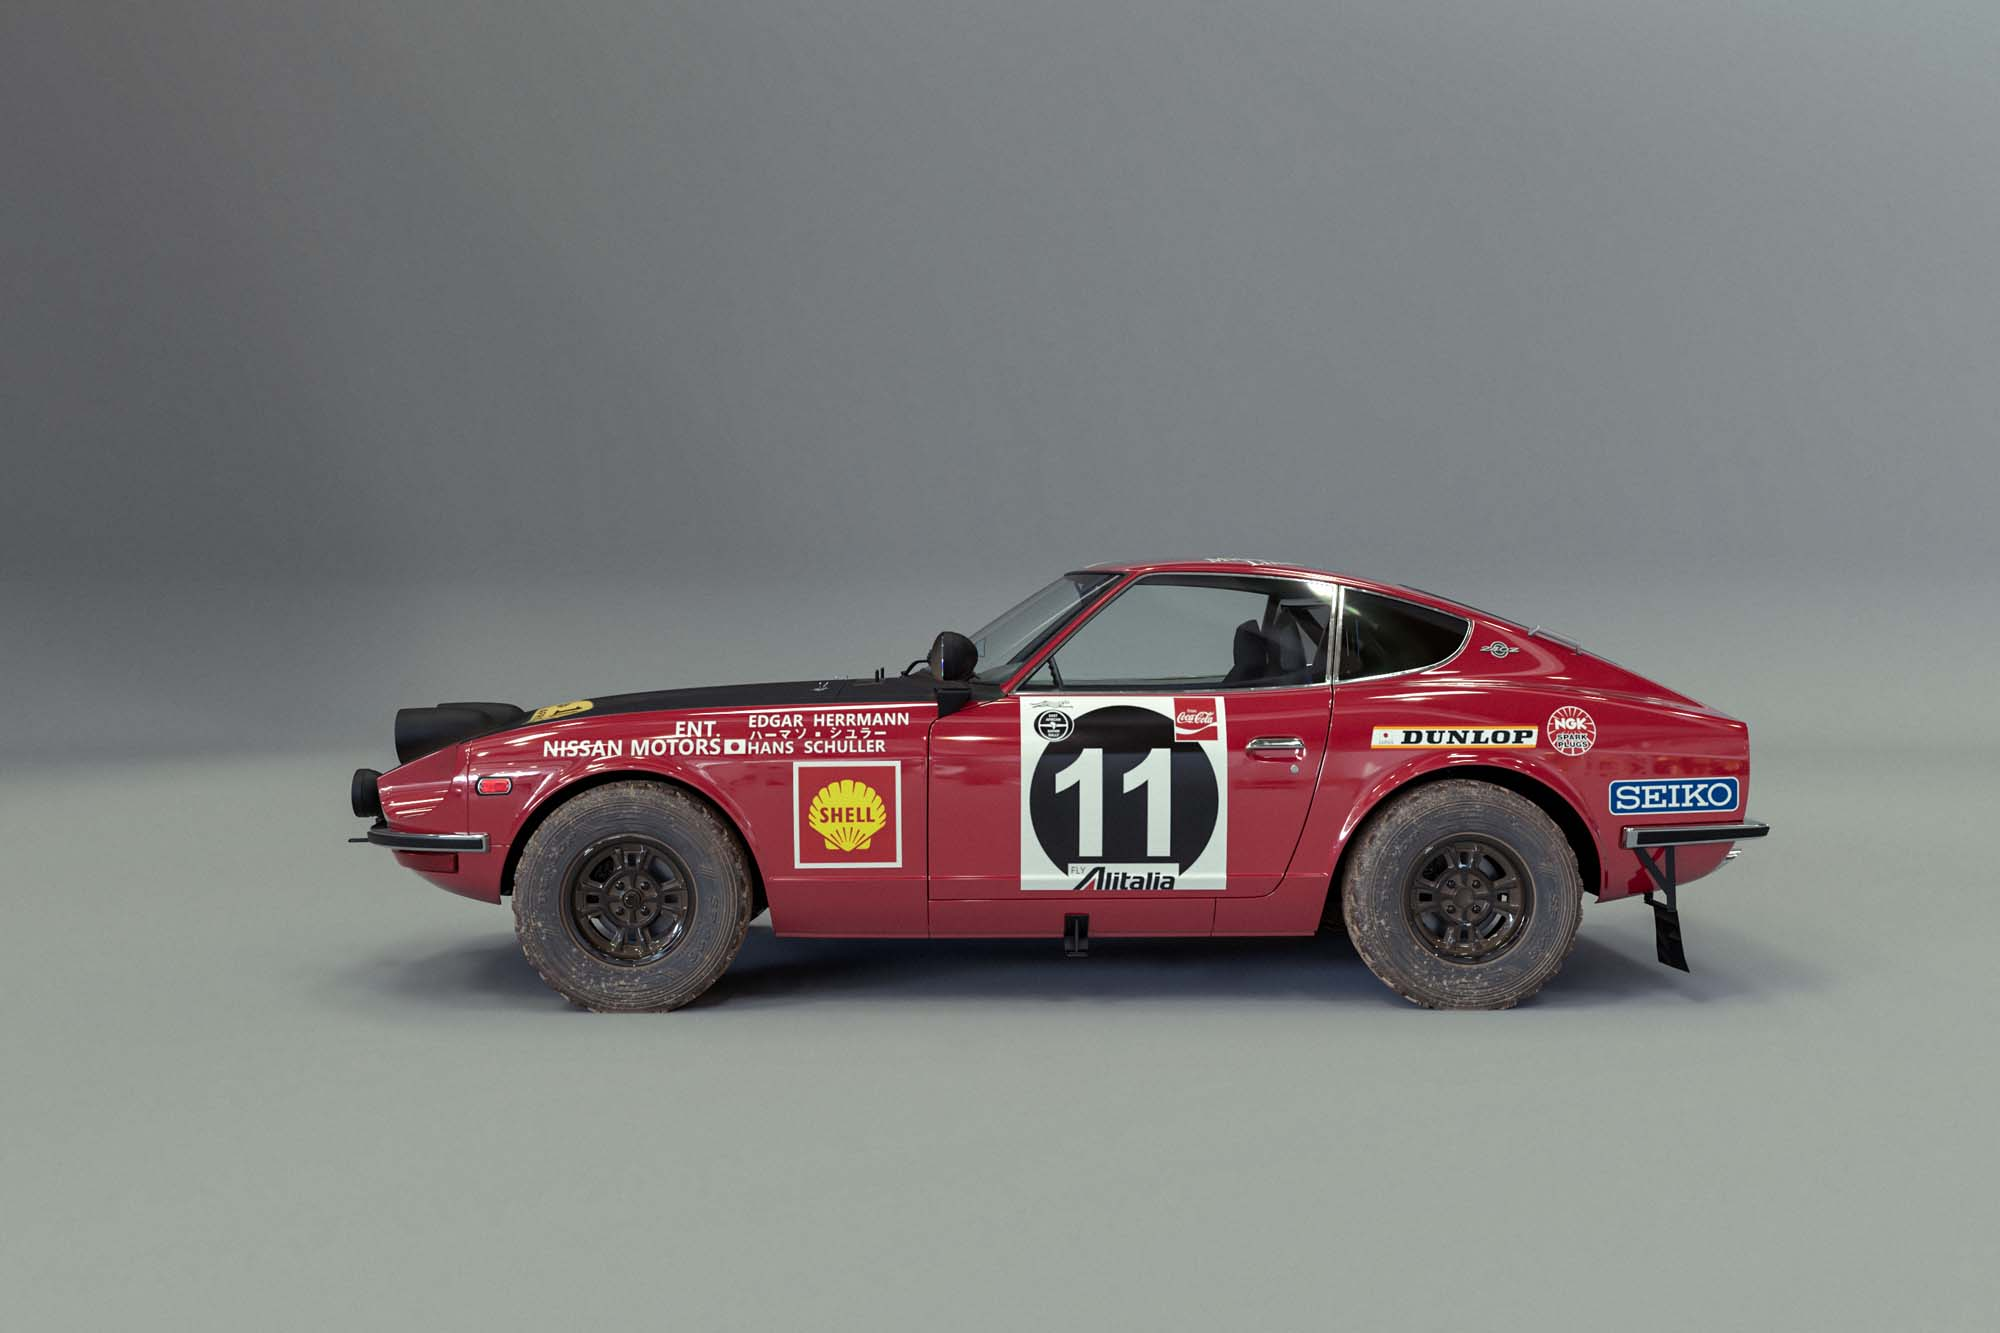 Datsun 240Z Heritage 2.JPG Πώς σου φαίνεται αυτό το Nissan Juke Rally; Nissan, Nissan Juke, zblog, ειδήσεις, Νέα